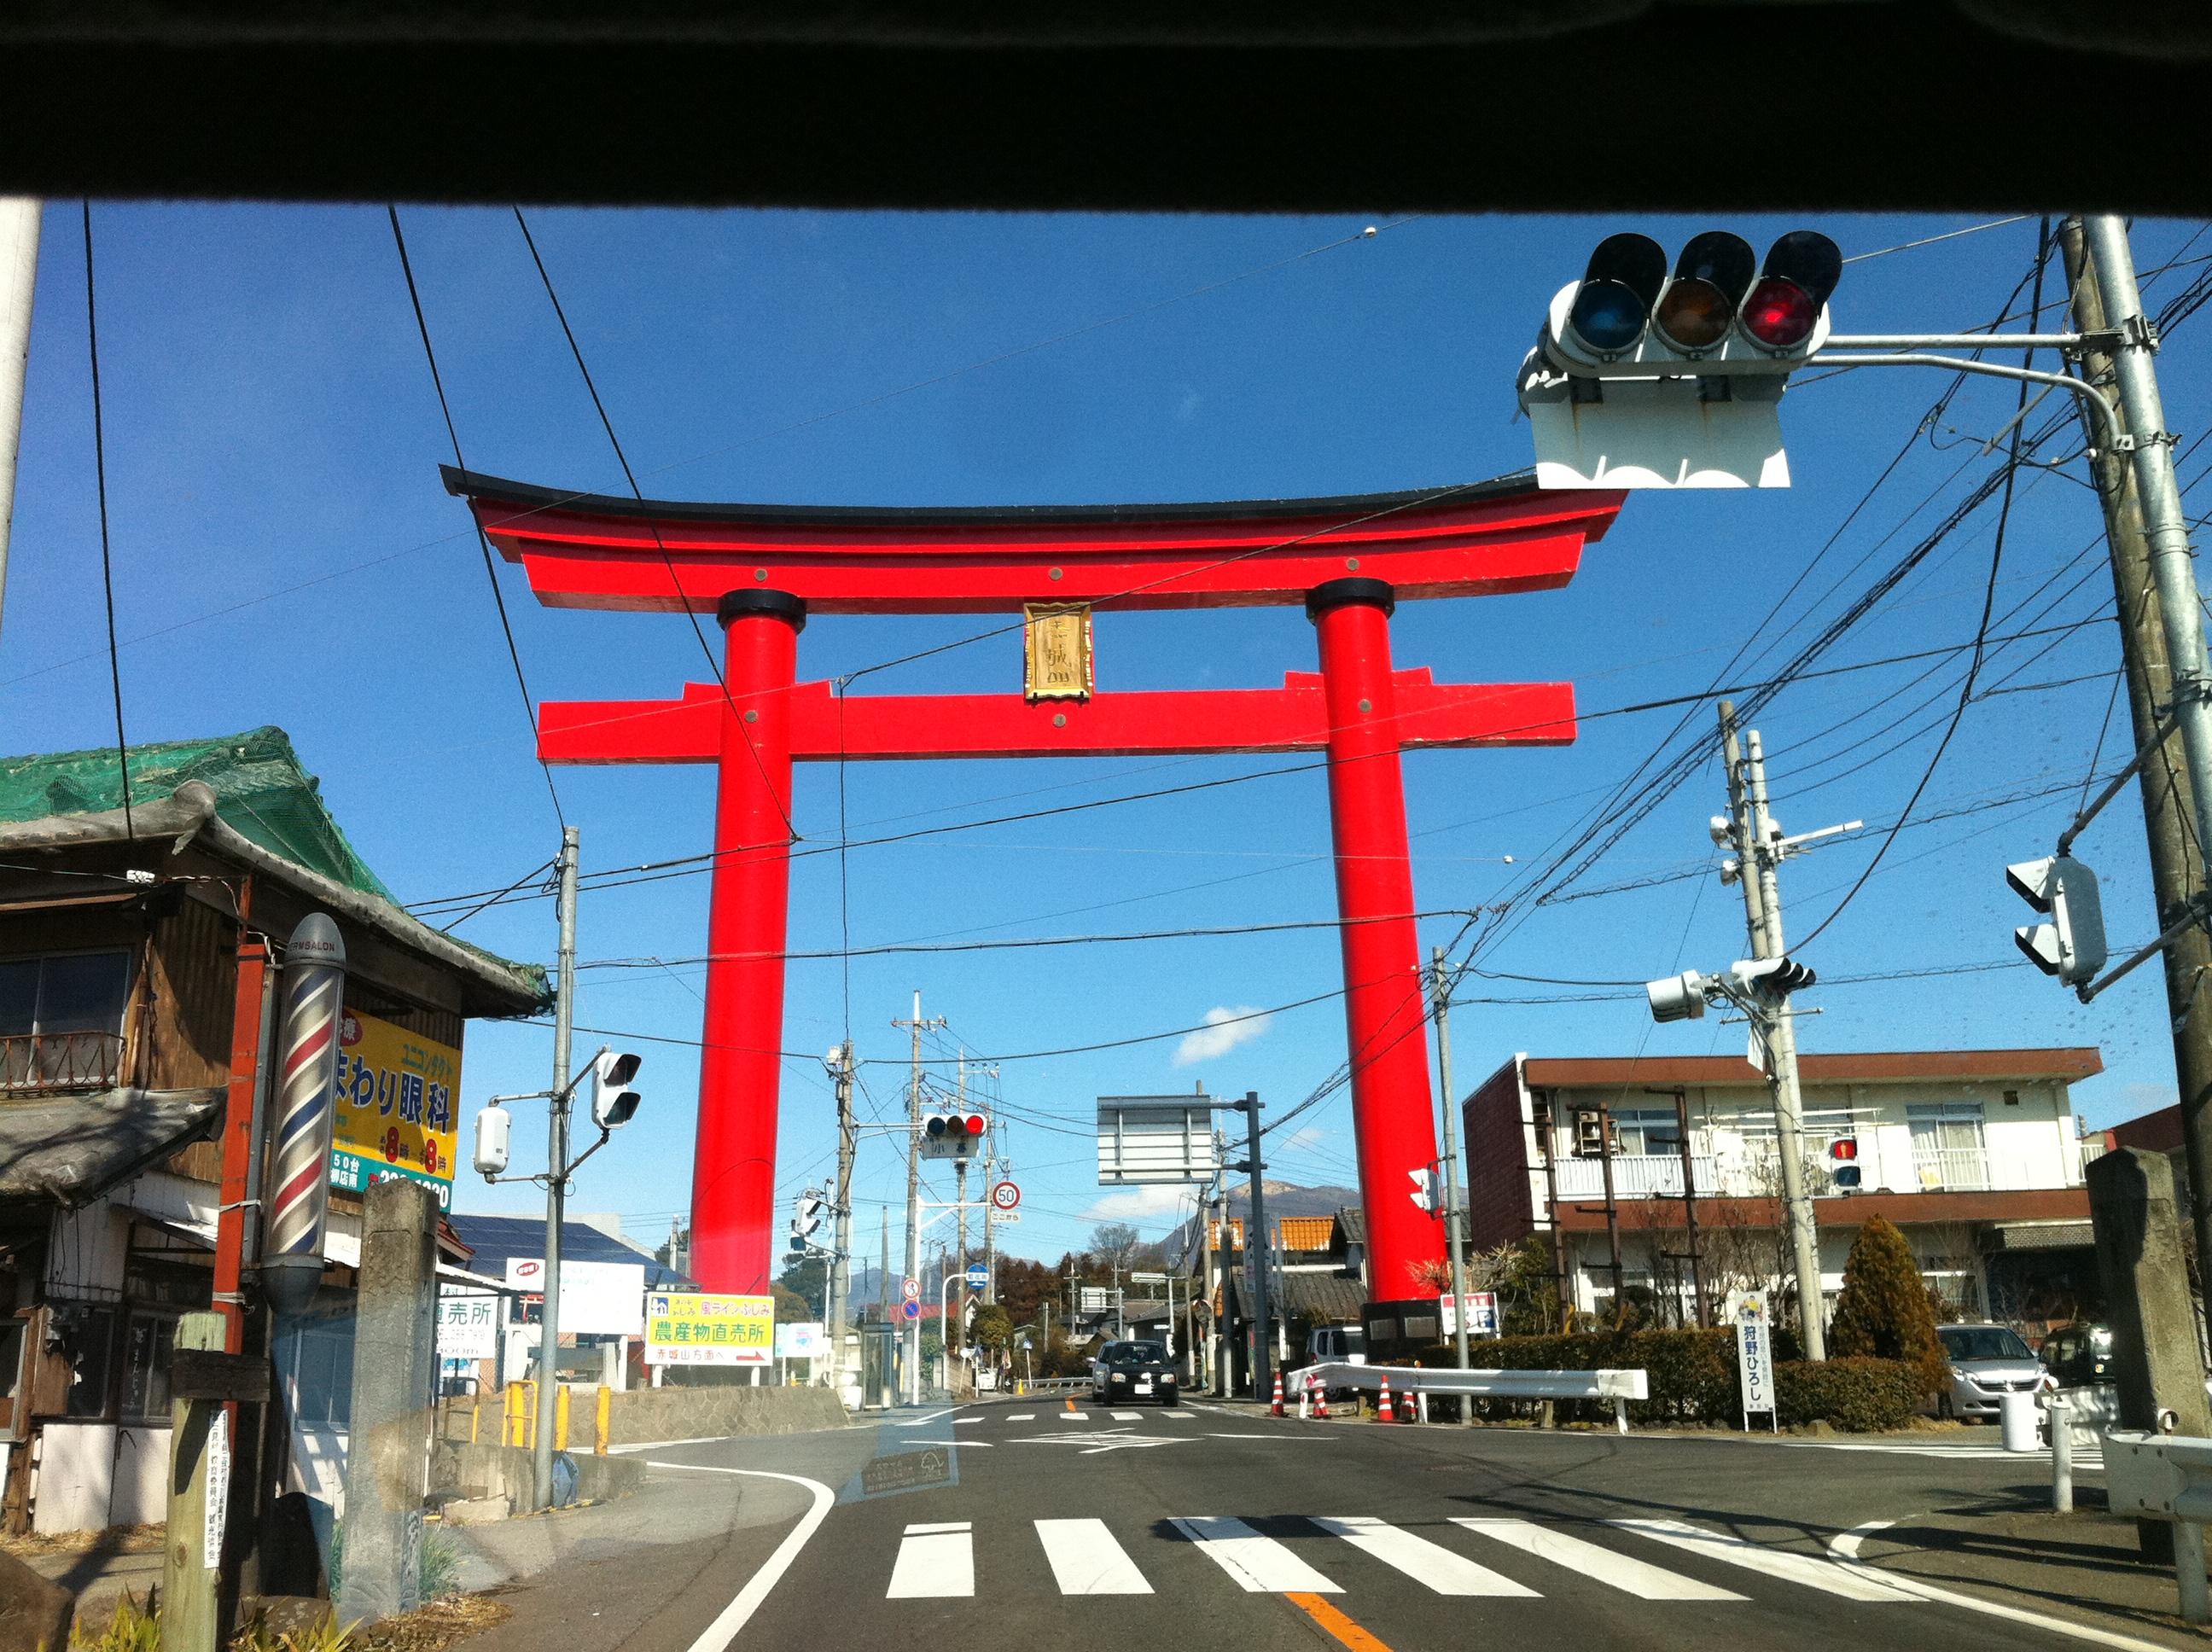 Japan Monument, Icon, Japan, Monument, Street, HQ Photo